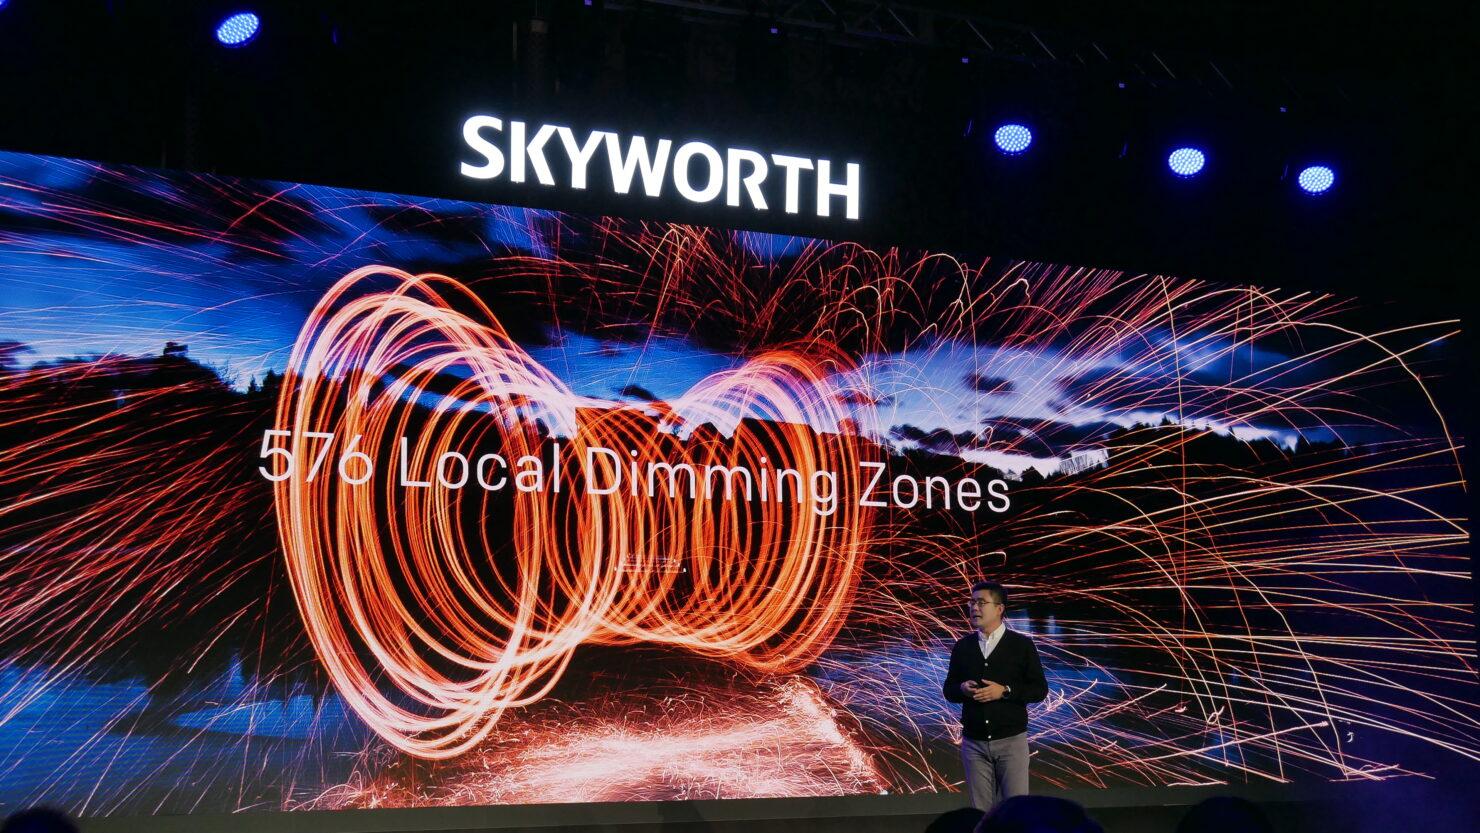 skyworth-ces-dimming-zones